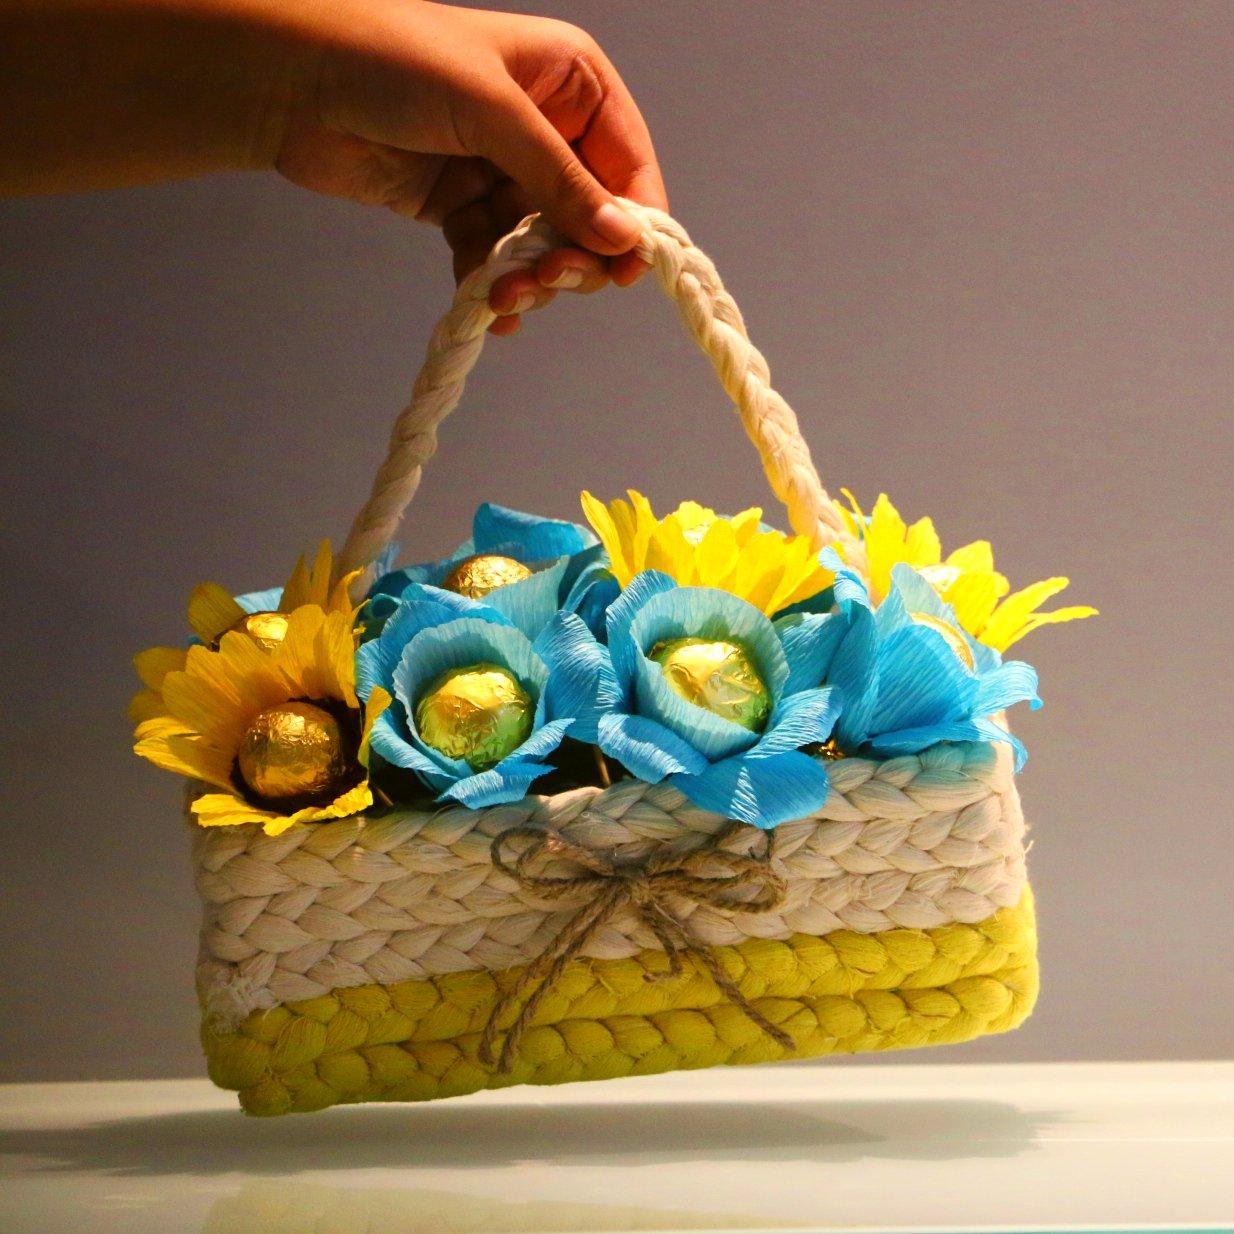 Birthday Gifts - Basketful - Blue and Yellow